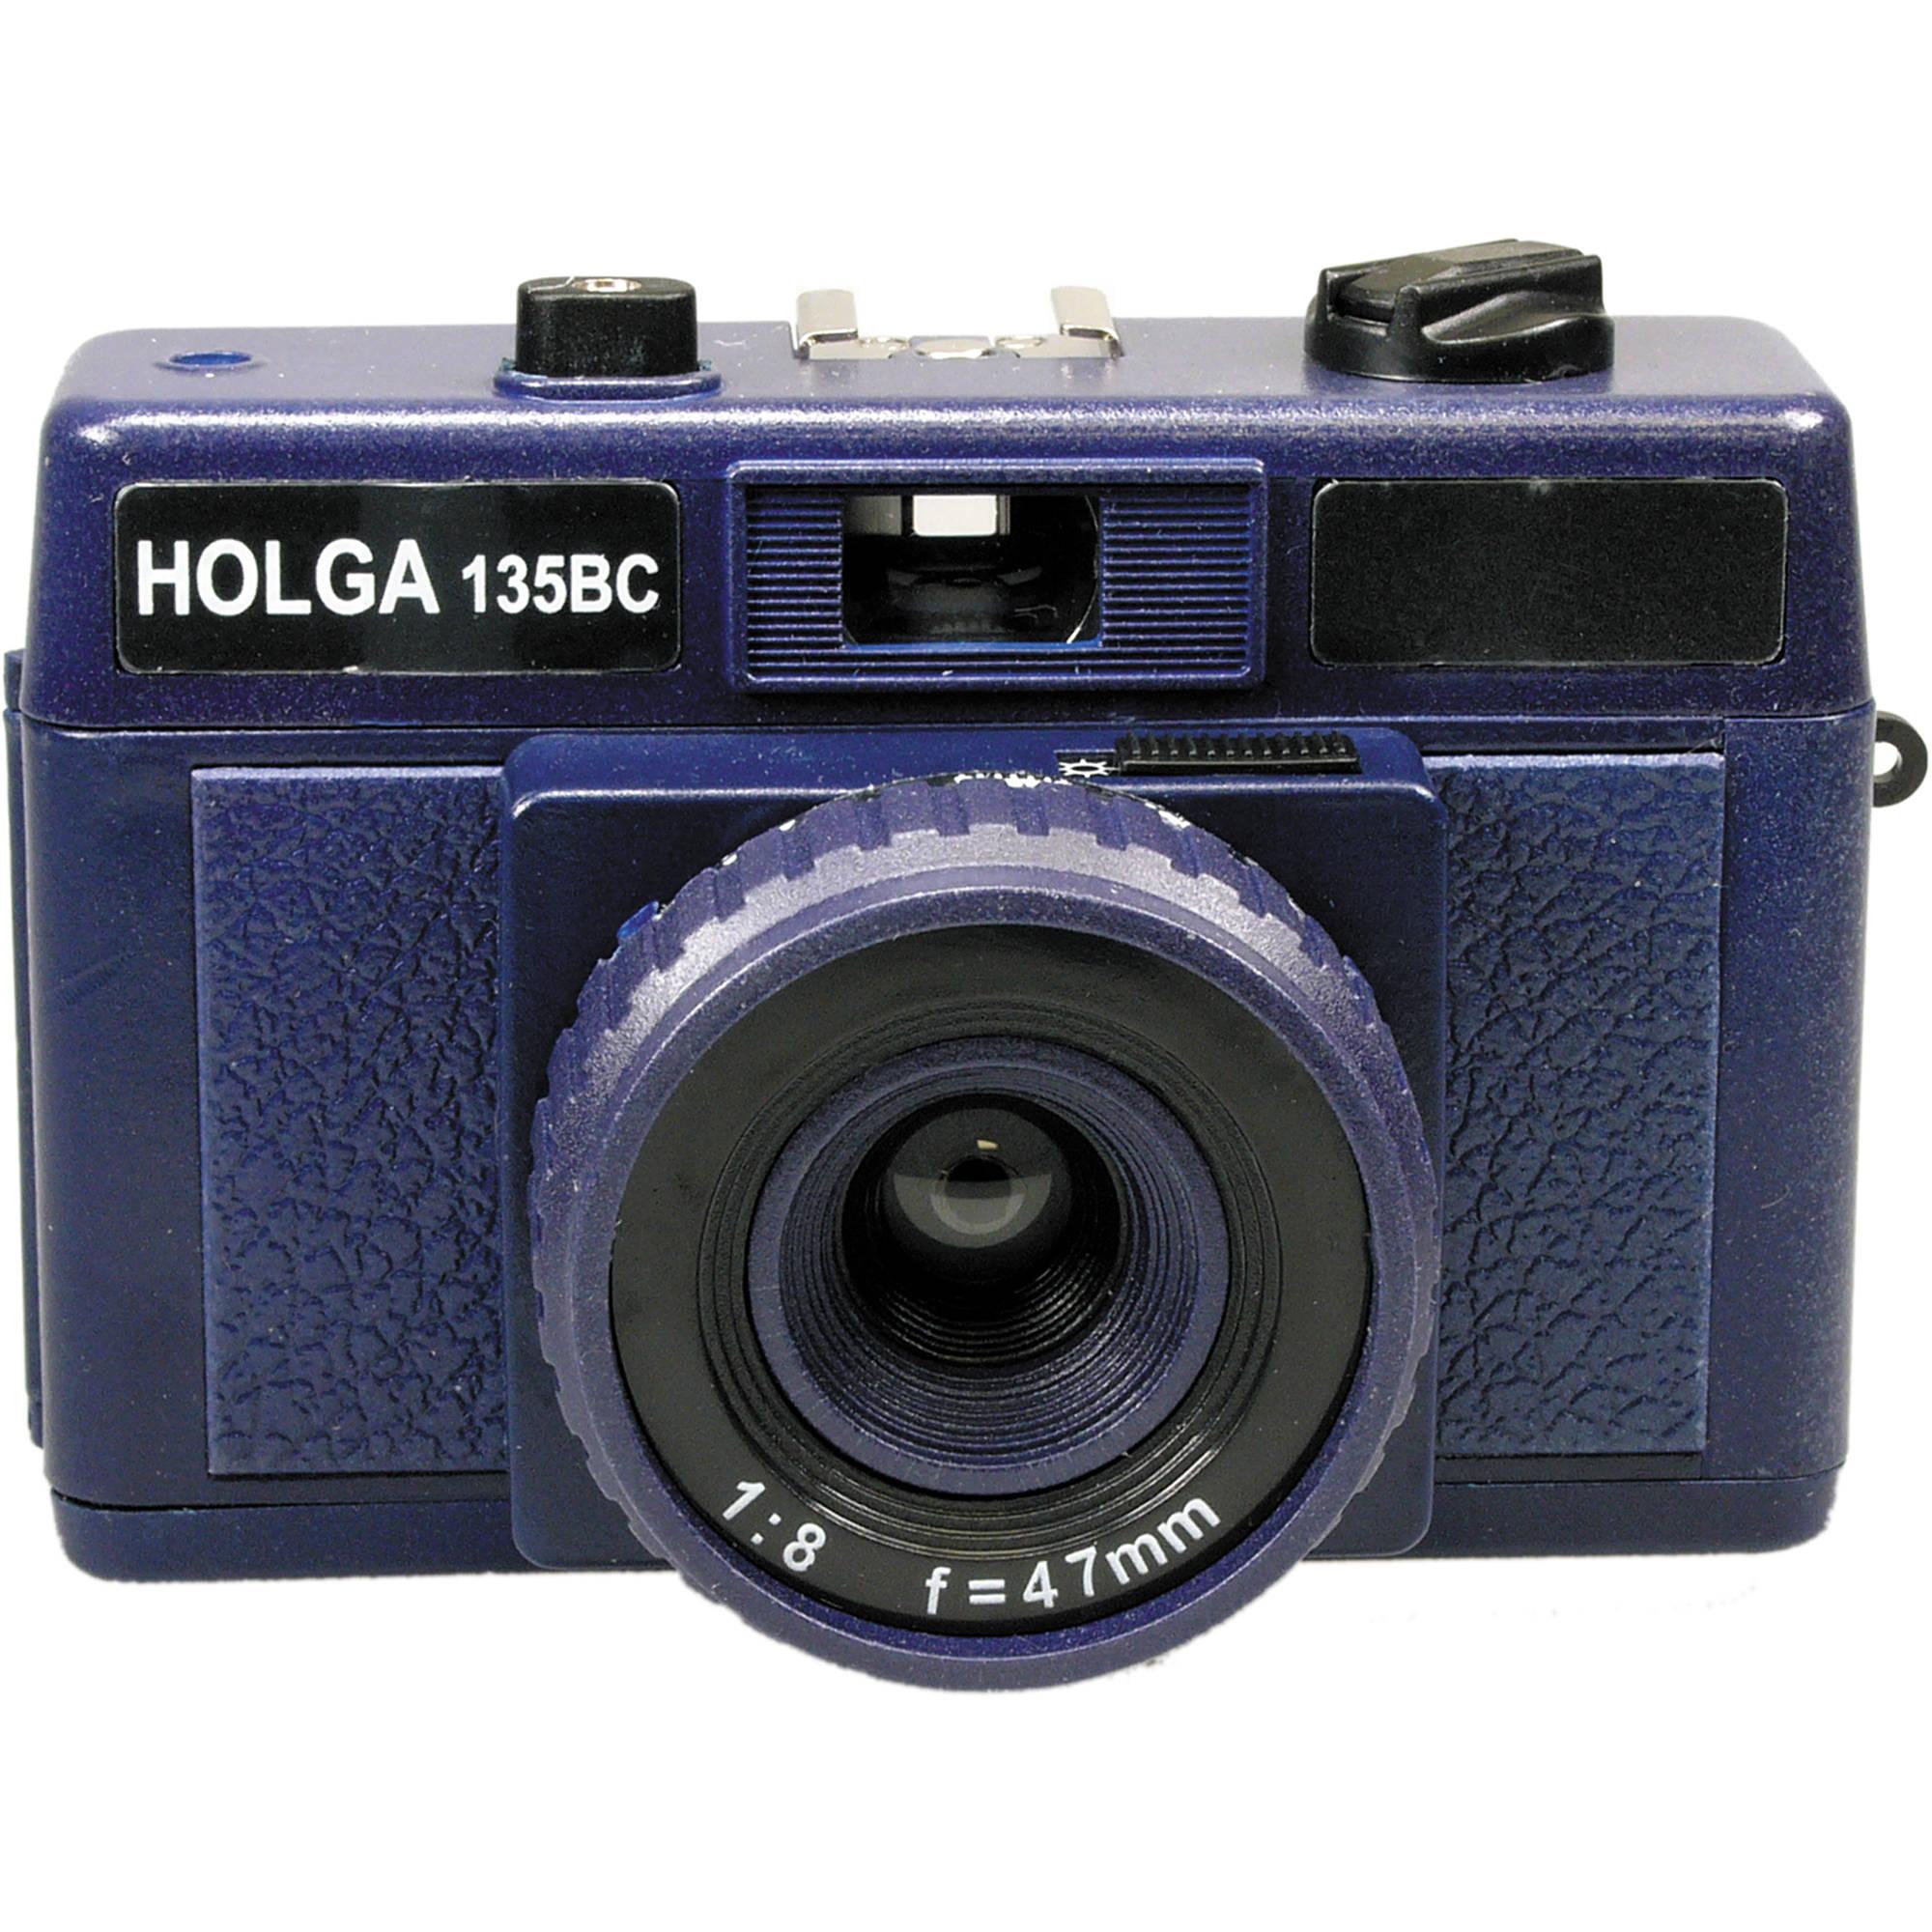 Holga HolgaGlo 135BC Glows in the Dark Camera 225135 B&H Photo